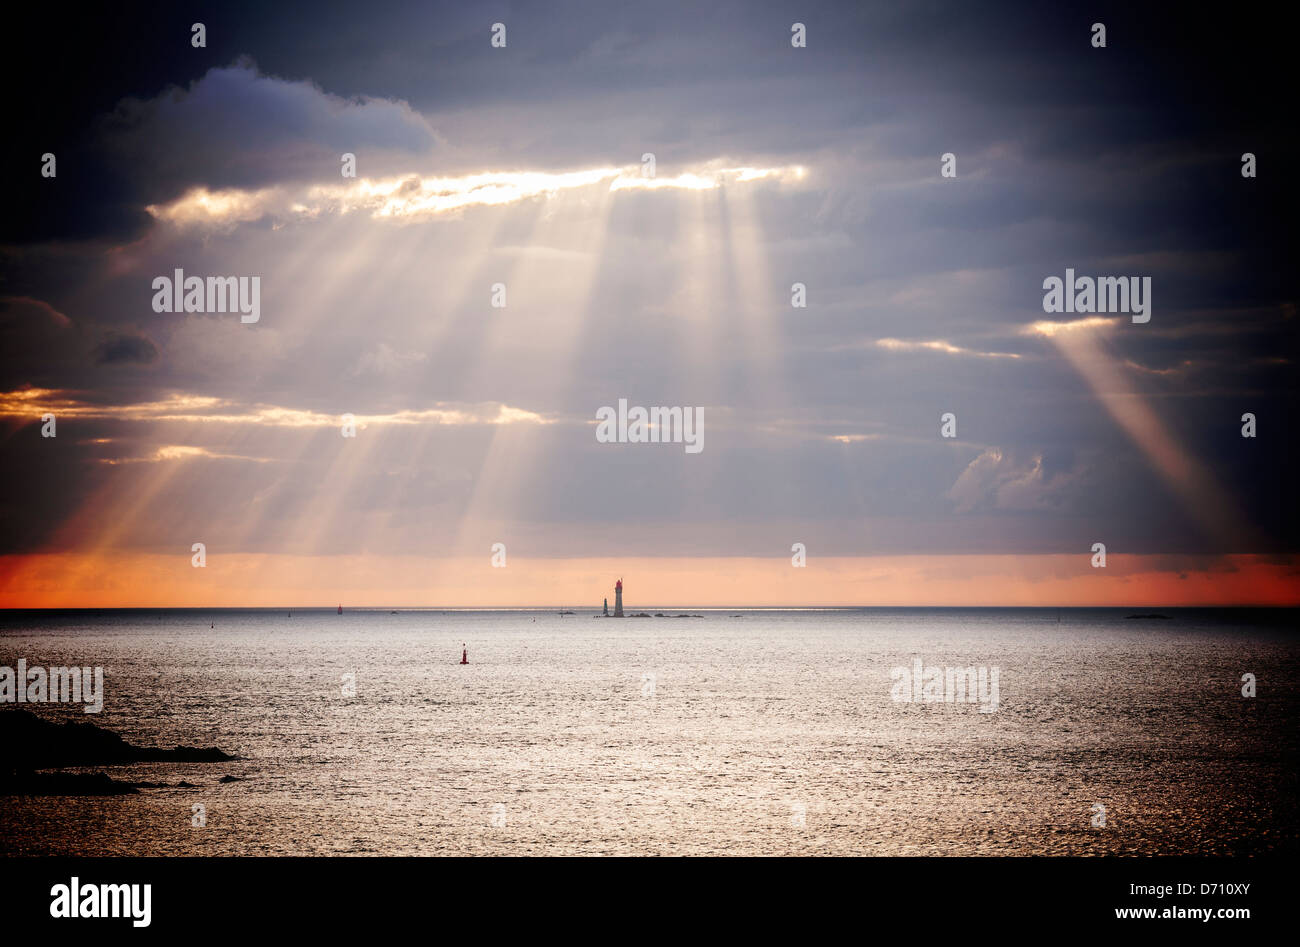 France Bretagne Saint-malo - Seascape seascape au large de Saint-Malo avec rayons, chevrons, ou Godlight. Photo Stock